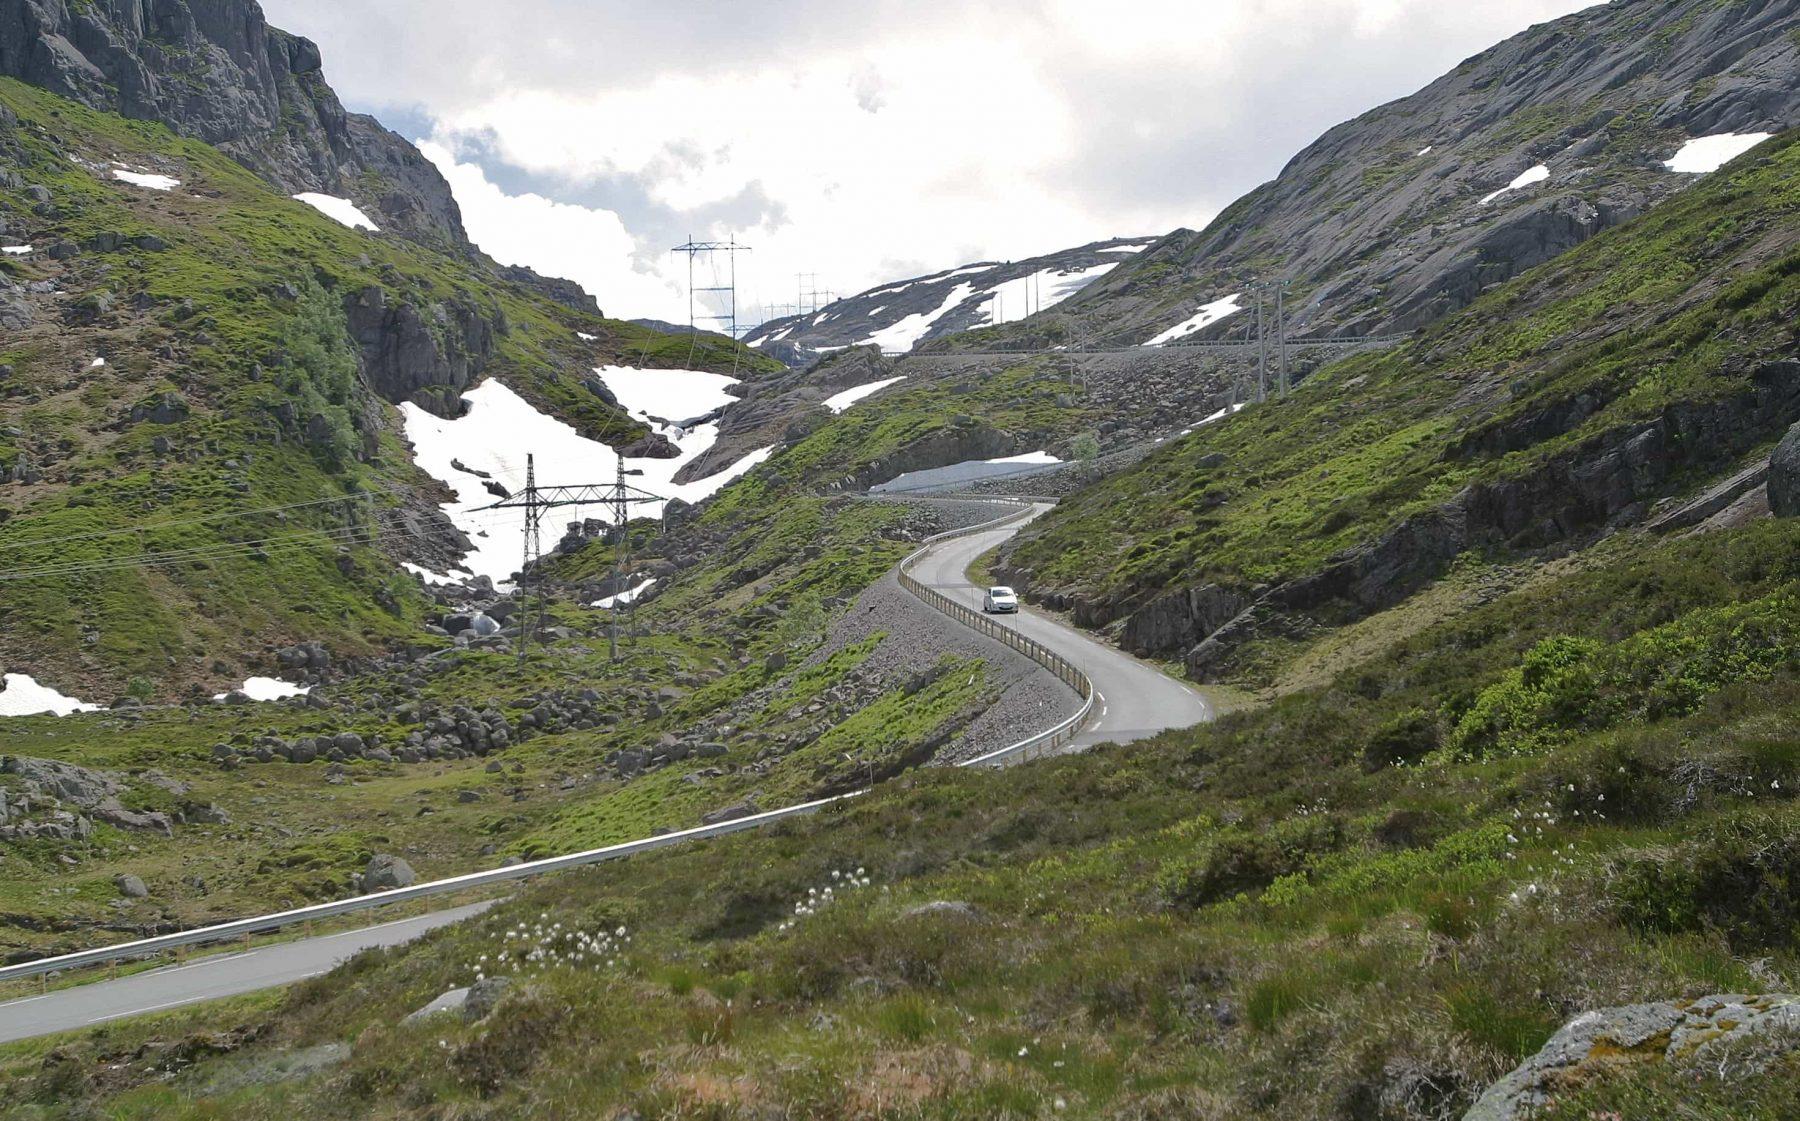 Suleskarvegen / Lysevegen at Øygardstøl